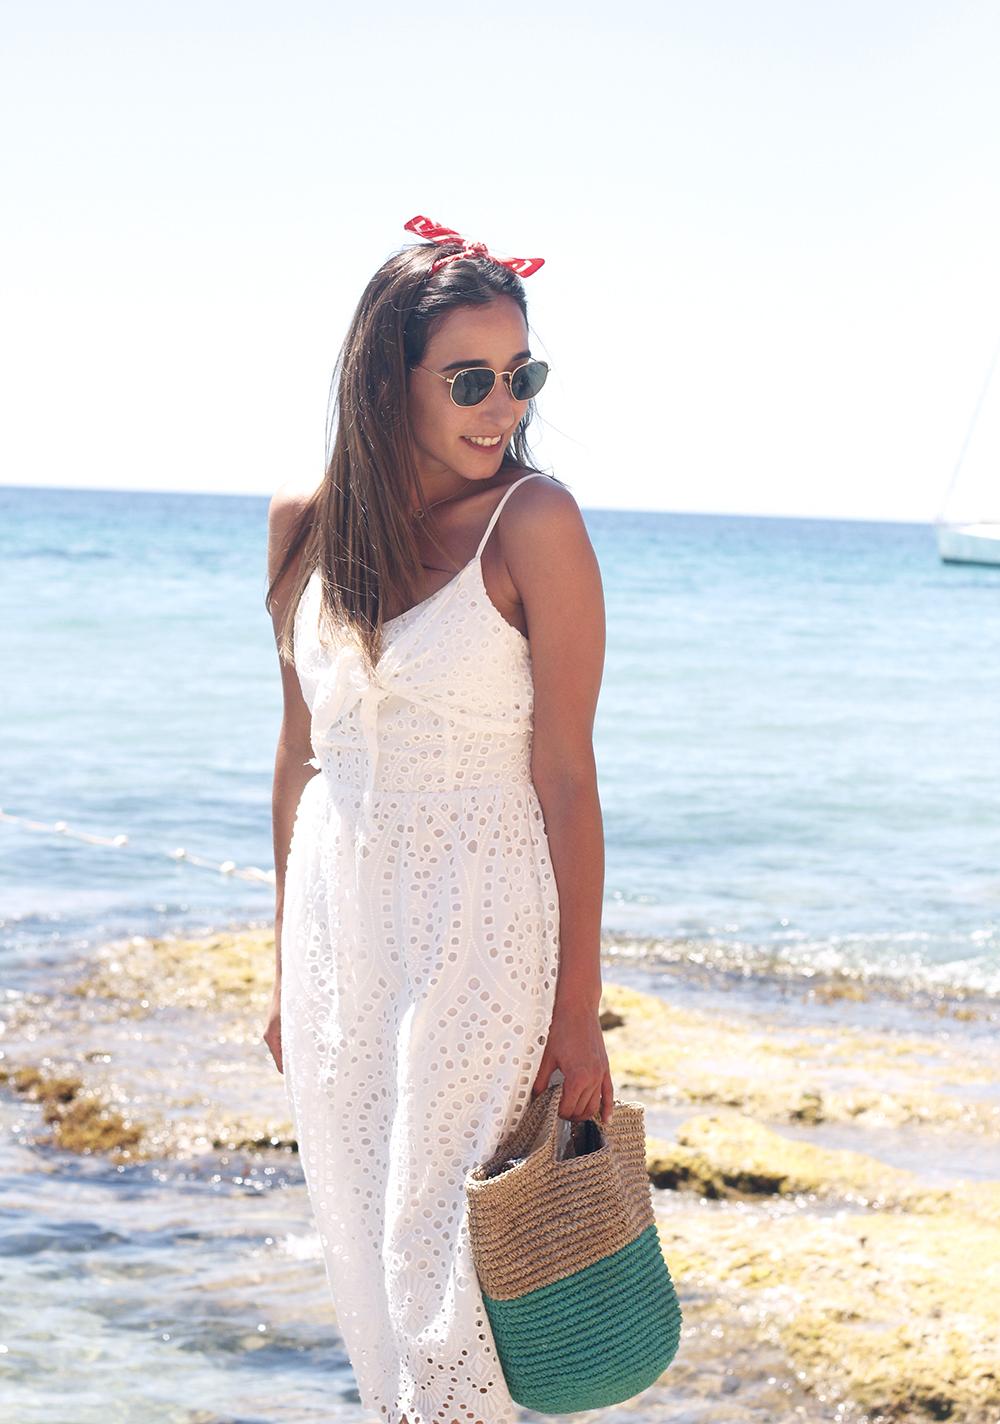 white summer dress white converse rayban sunglasses 2019 street style outfit vacation ibiza12